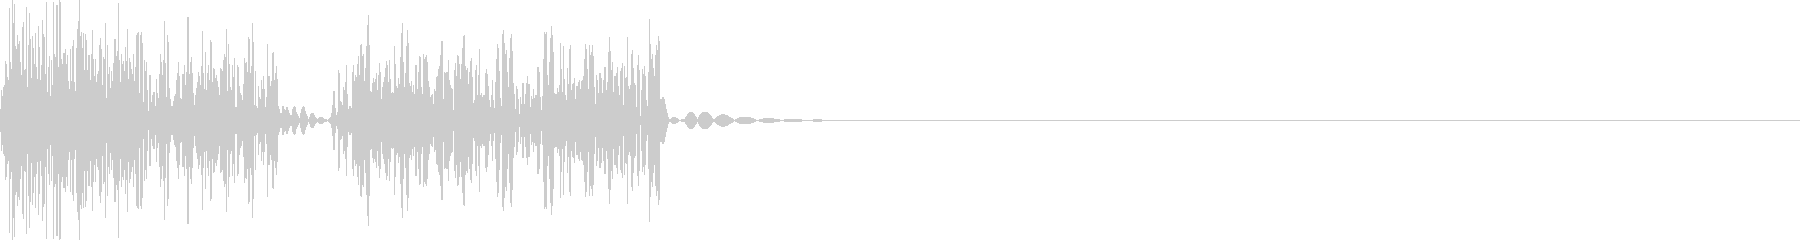 8bitなキャンセル音の未再生の波形